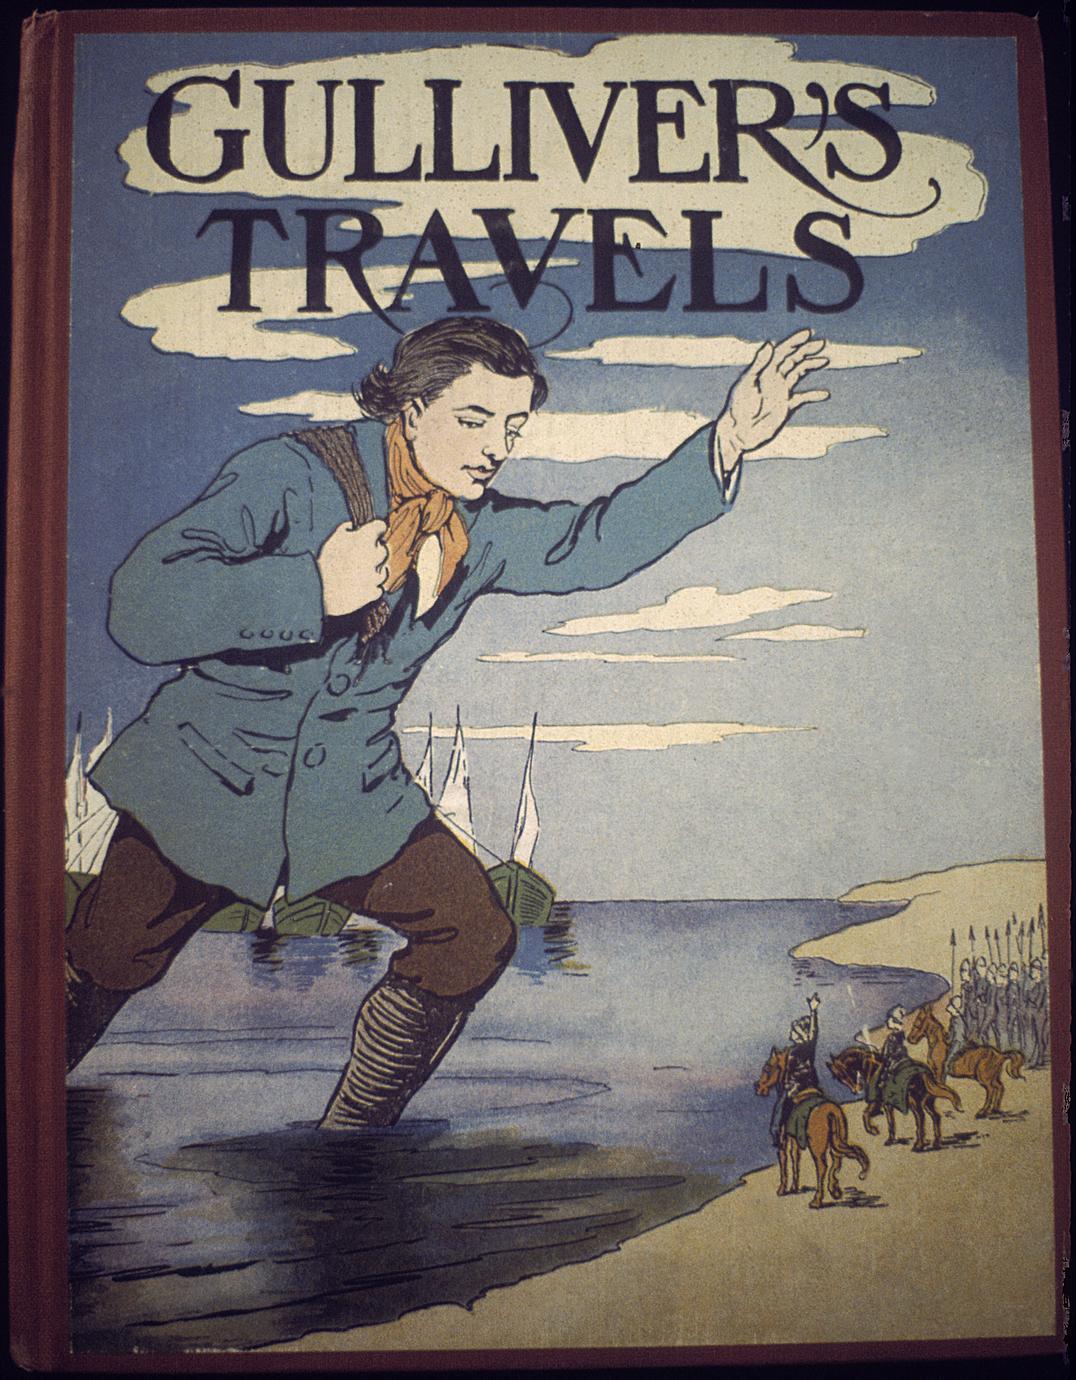 Gulliver's travels (1 of 2)